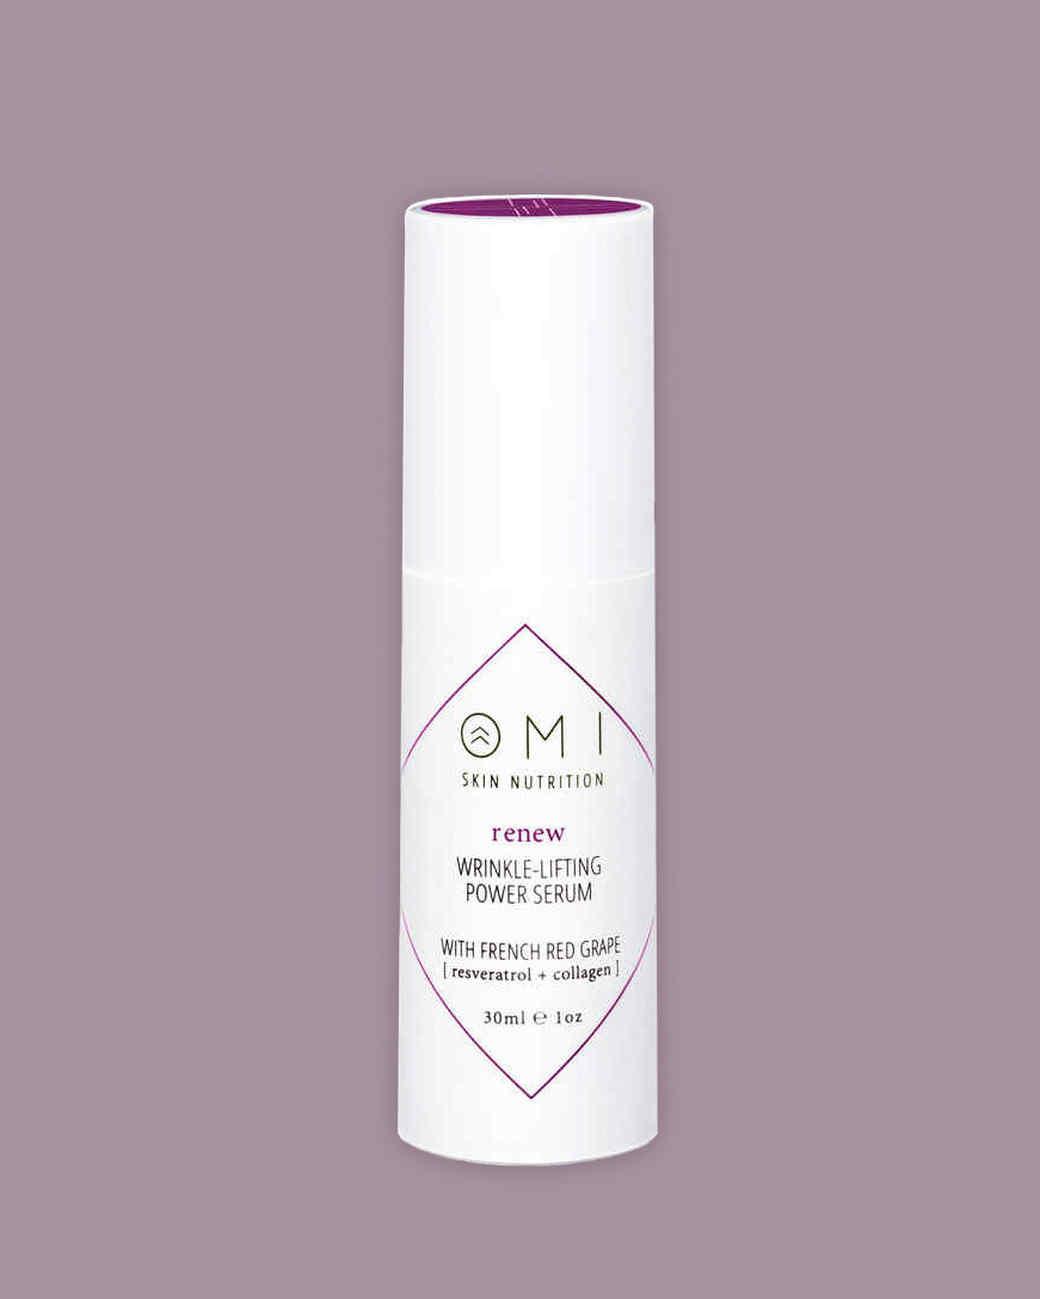 Omi Skin Nutrition renew wrinkle-lifting power serum